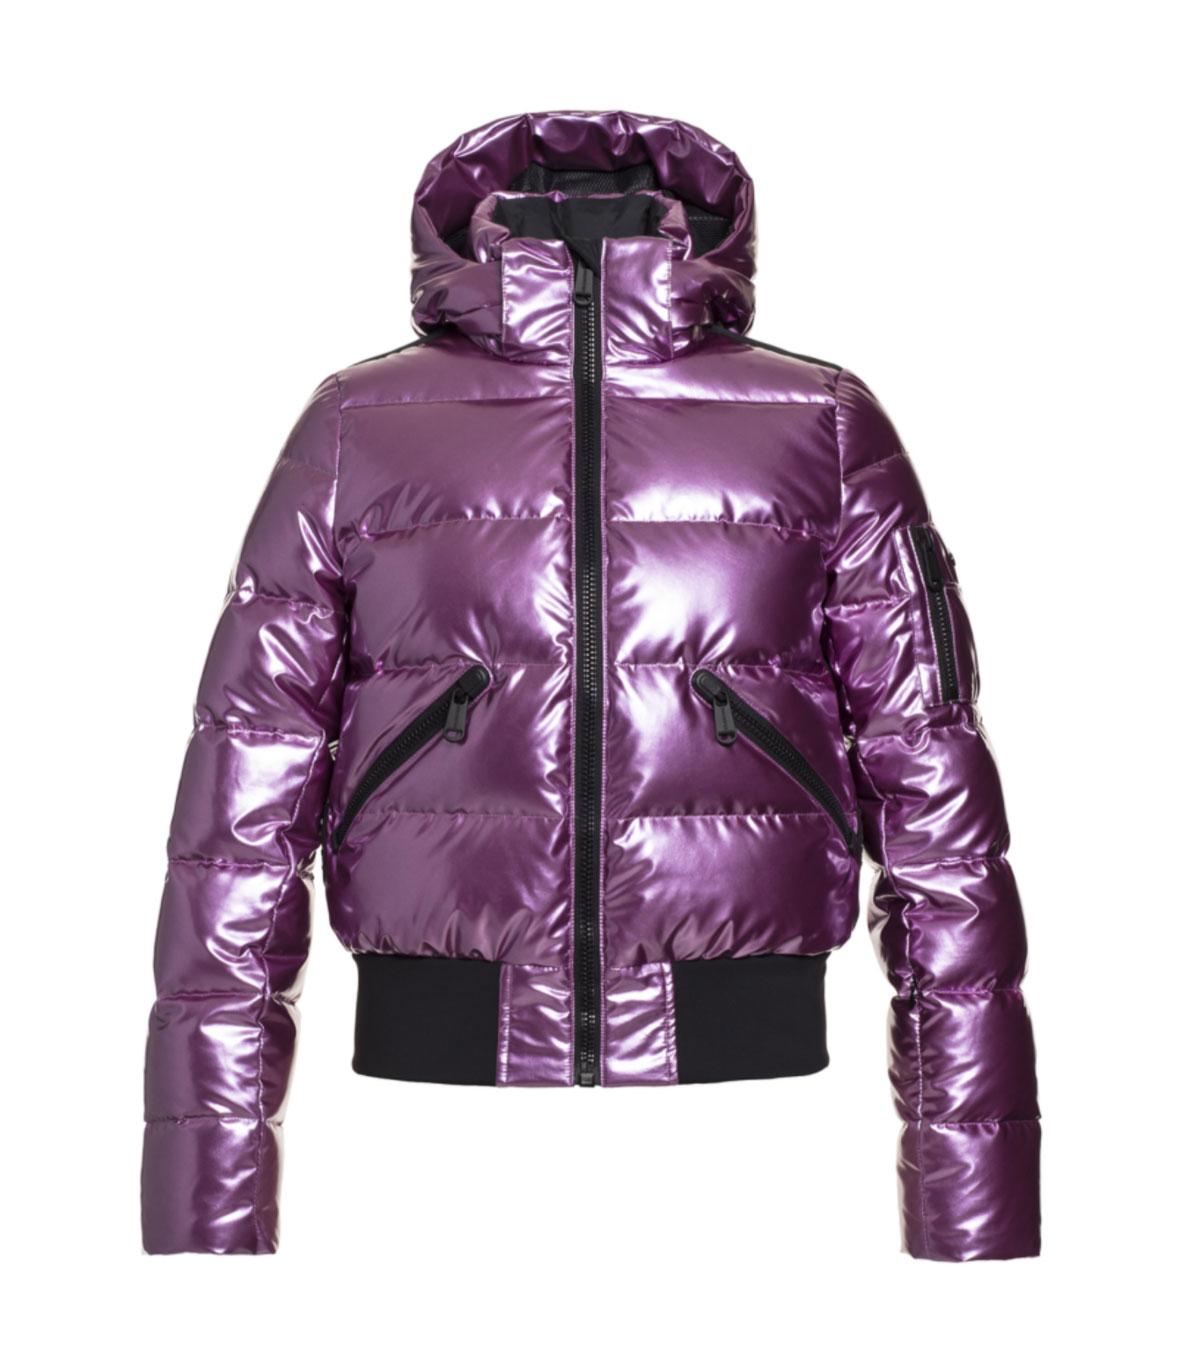 Sportalm's luxury ski jacket for Women